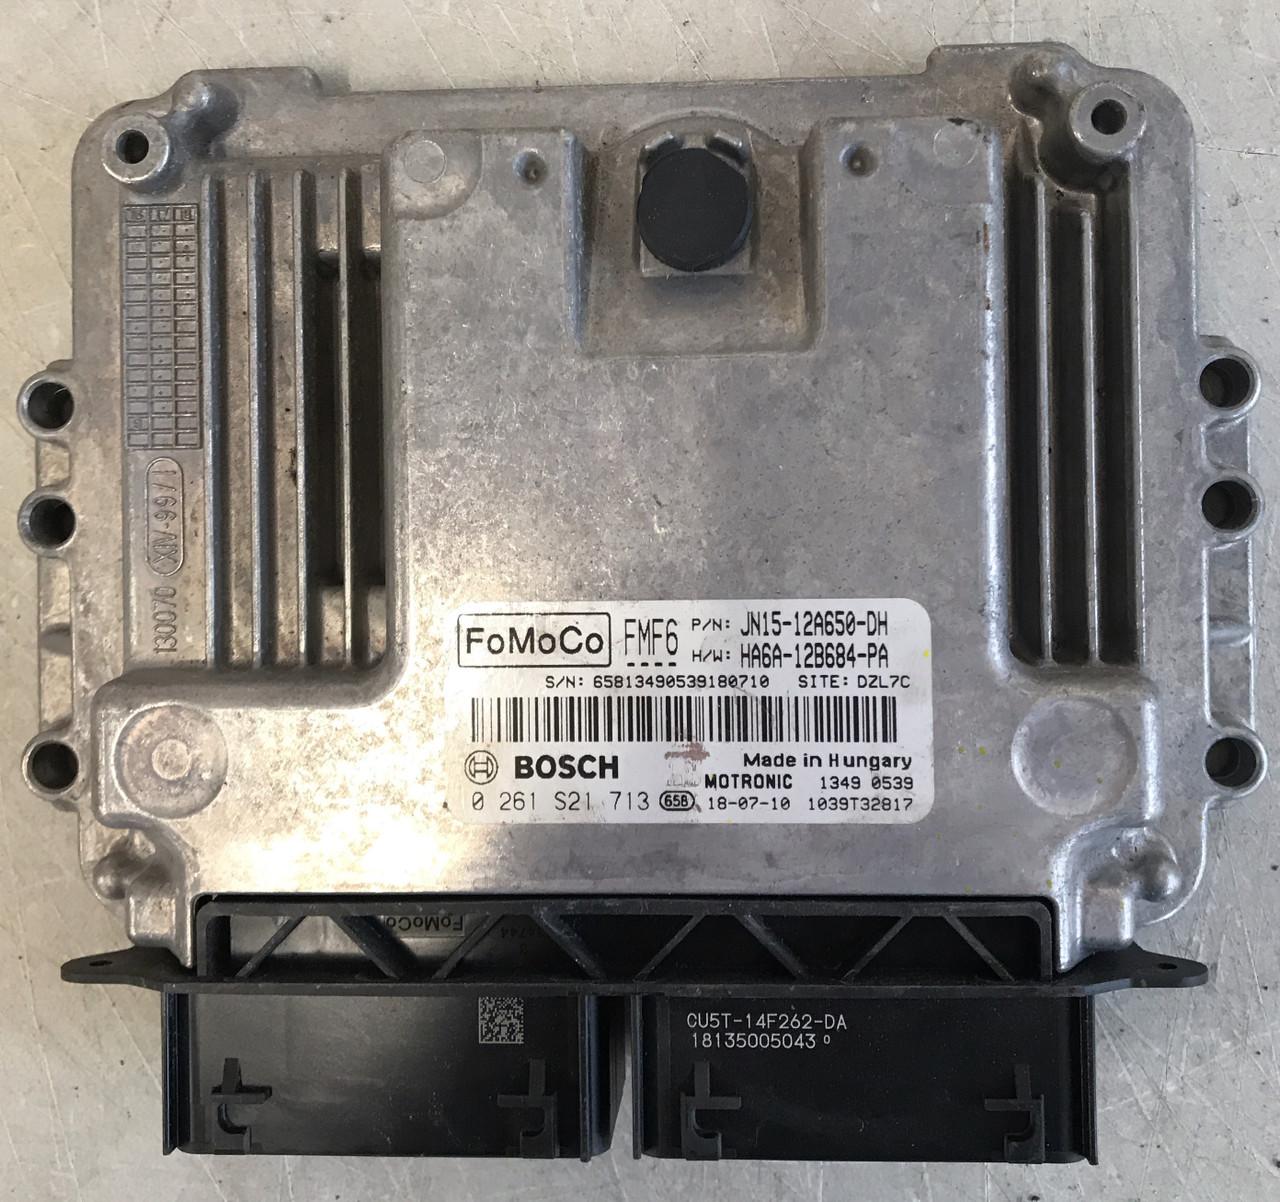 Ford, 0261S21713, 0 261 S21 713, JN15-12A650-DH, JN1512A650DH, HA6A-12B684-PA, HA6A12B684PA, 1039T32817